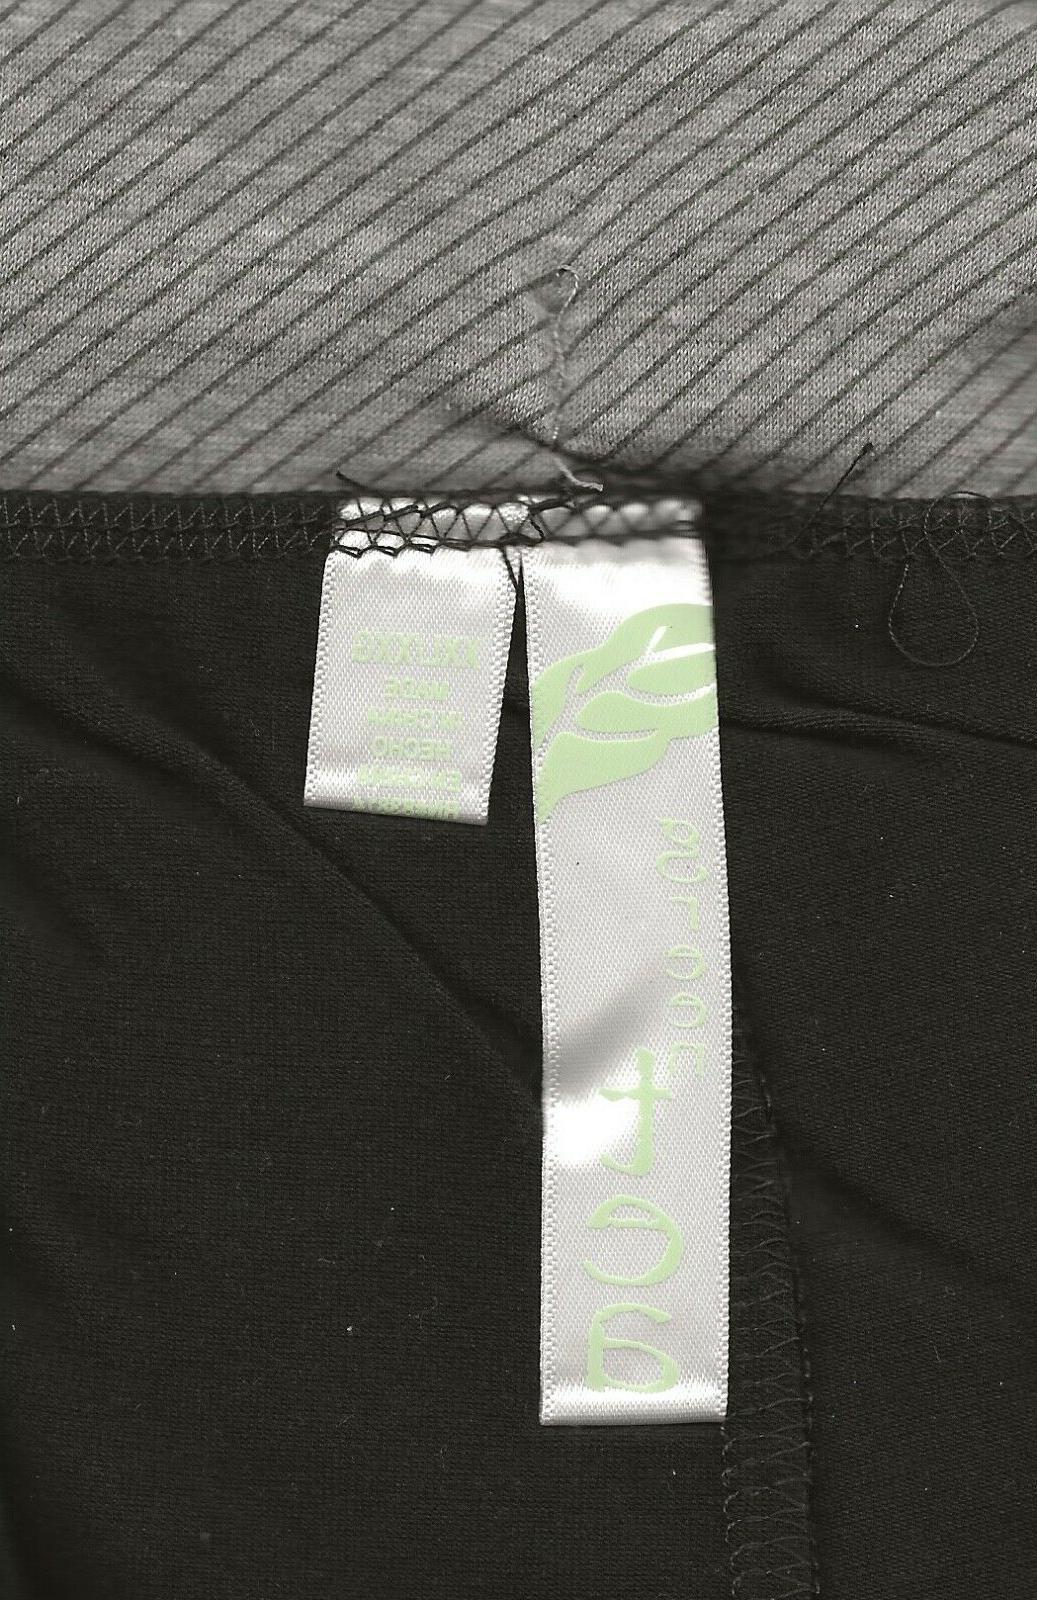 Green Jersey - Olive Green Wm's XXL - blend, Pockets